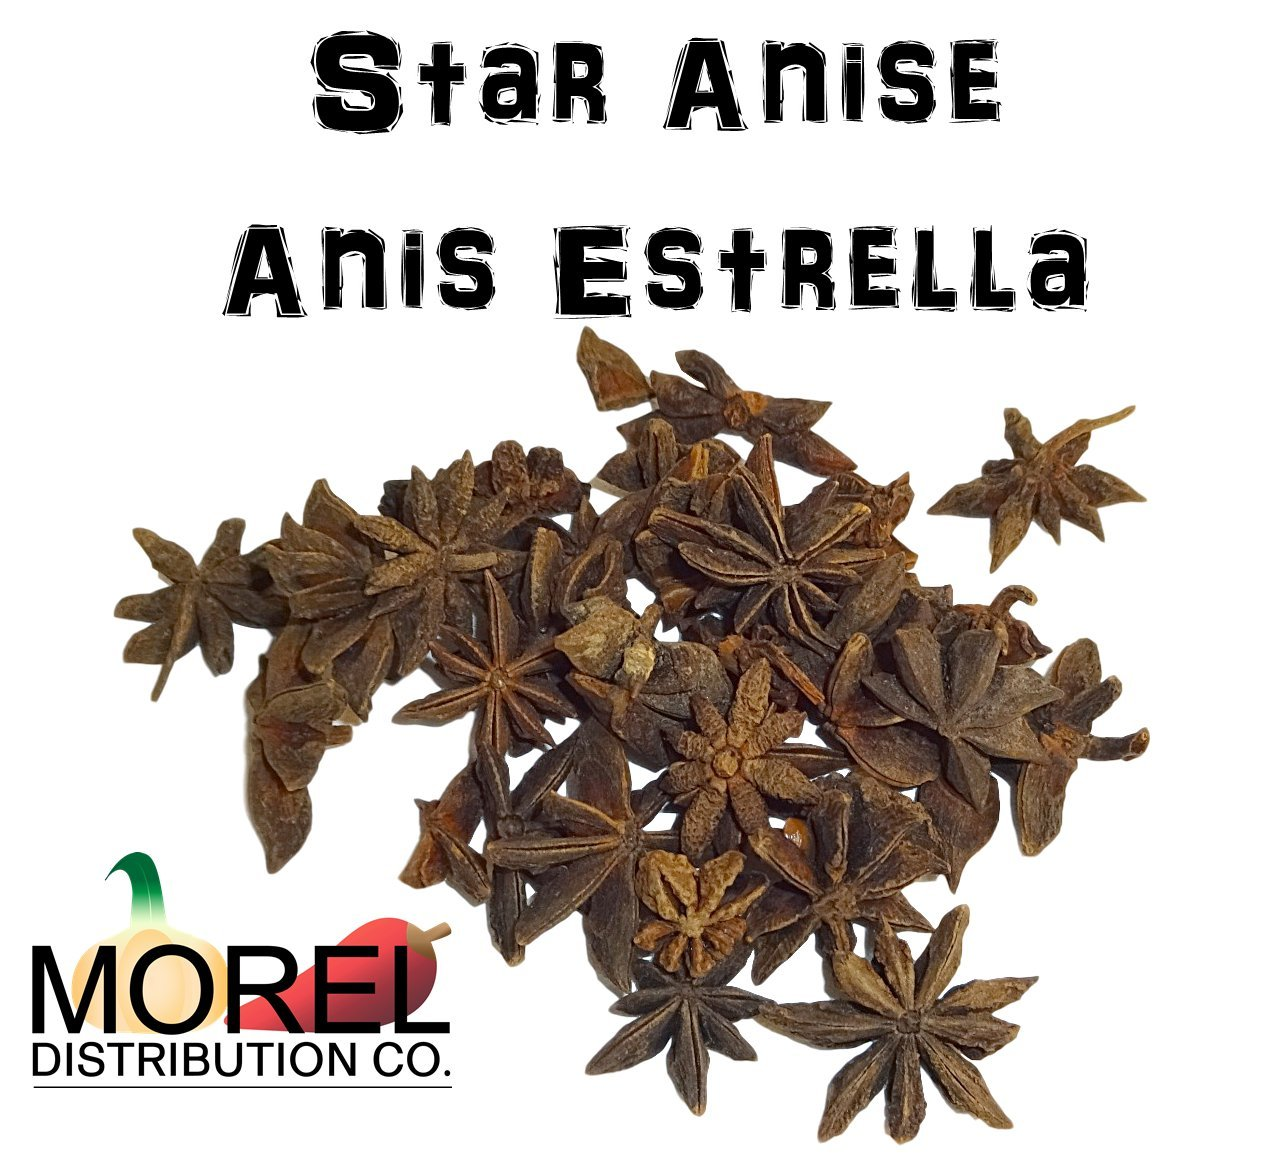 Buy Star Anise Seeds or Star Anise Pods (Anis Estrella) (2 ...